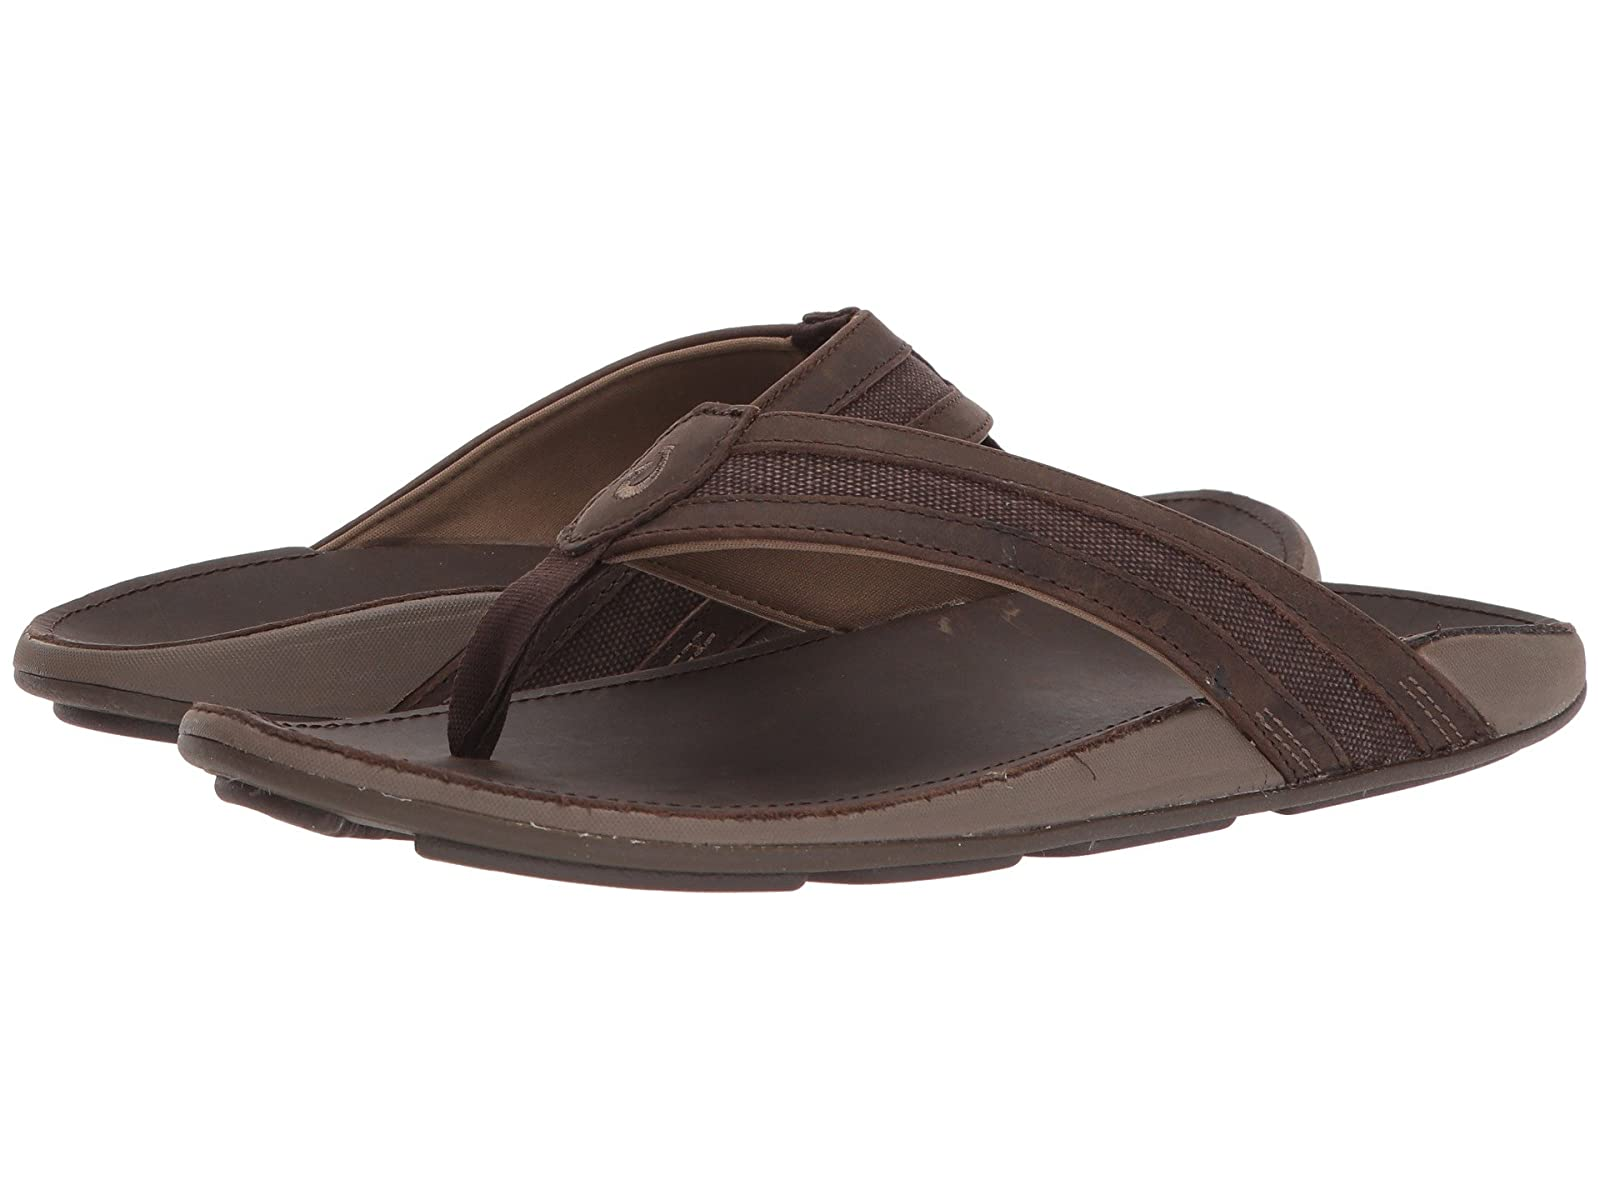 OluKai 'IkoiAtmospheric grades have affordable shoes